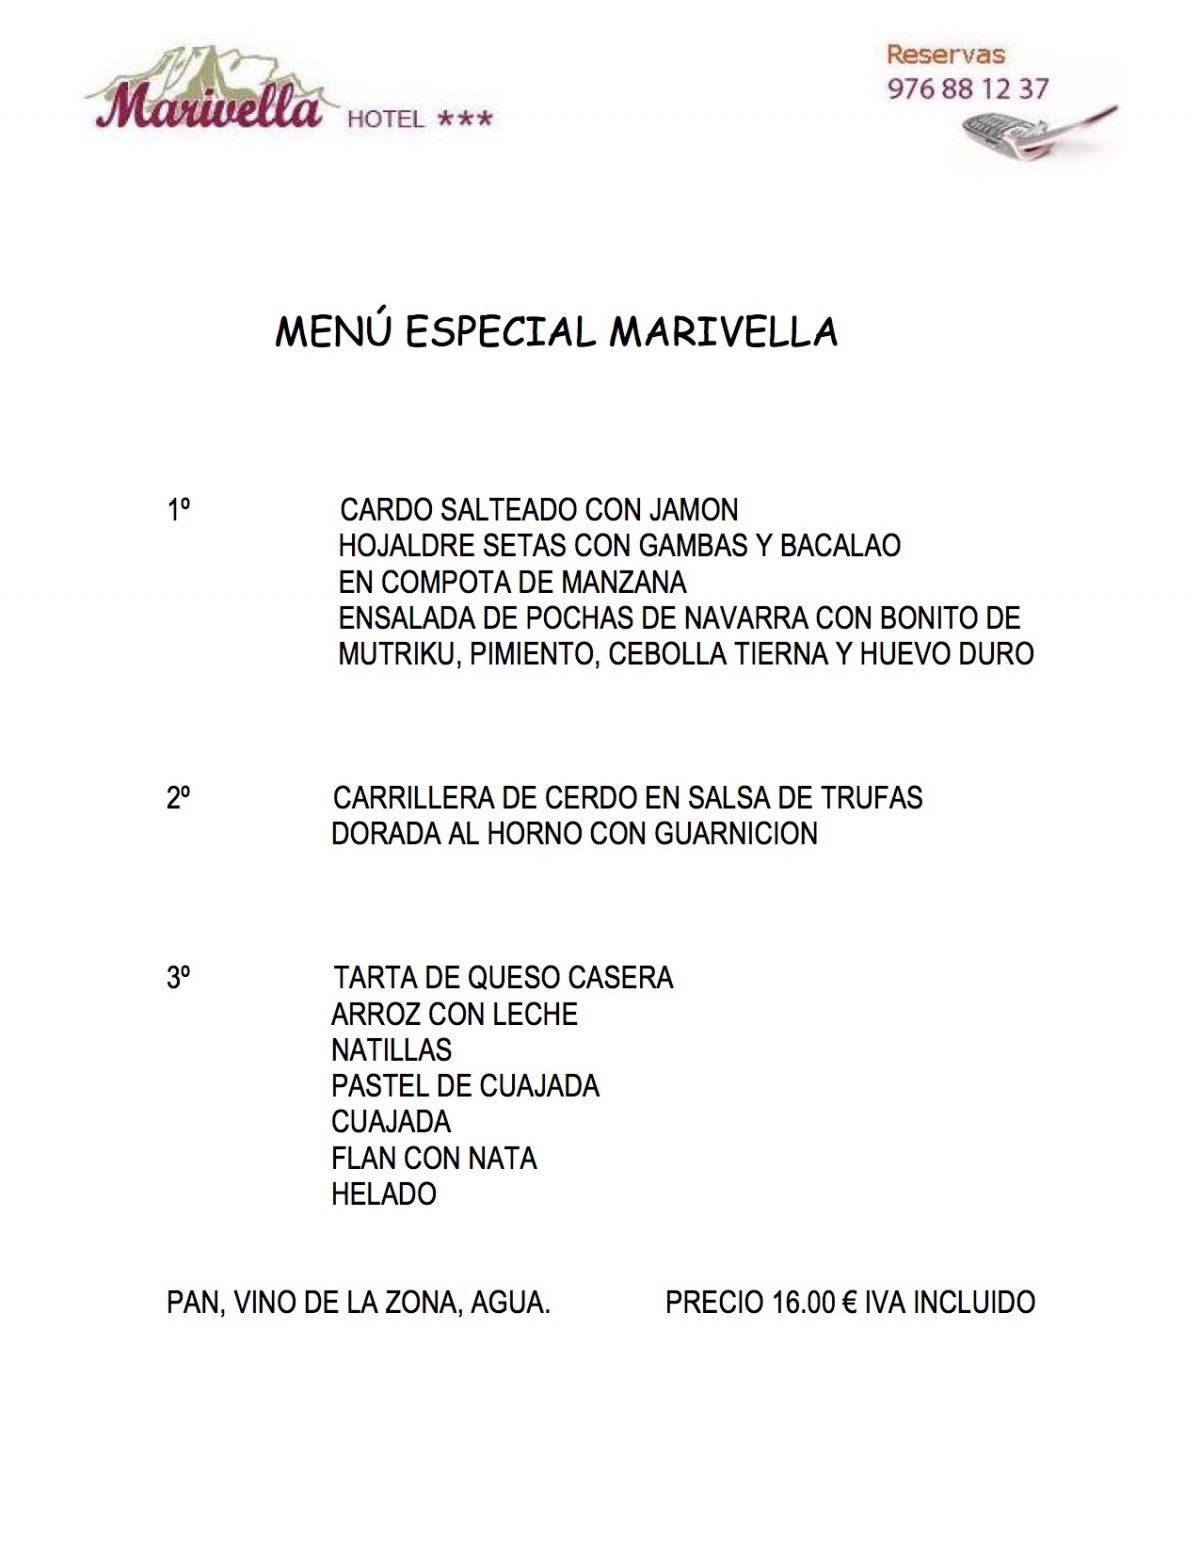 MENU-ESPECIAL-MARIVELLA-DORADA-100617-1200x1553.jpg